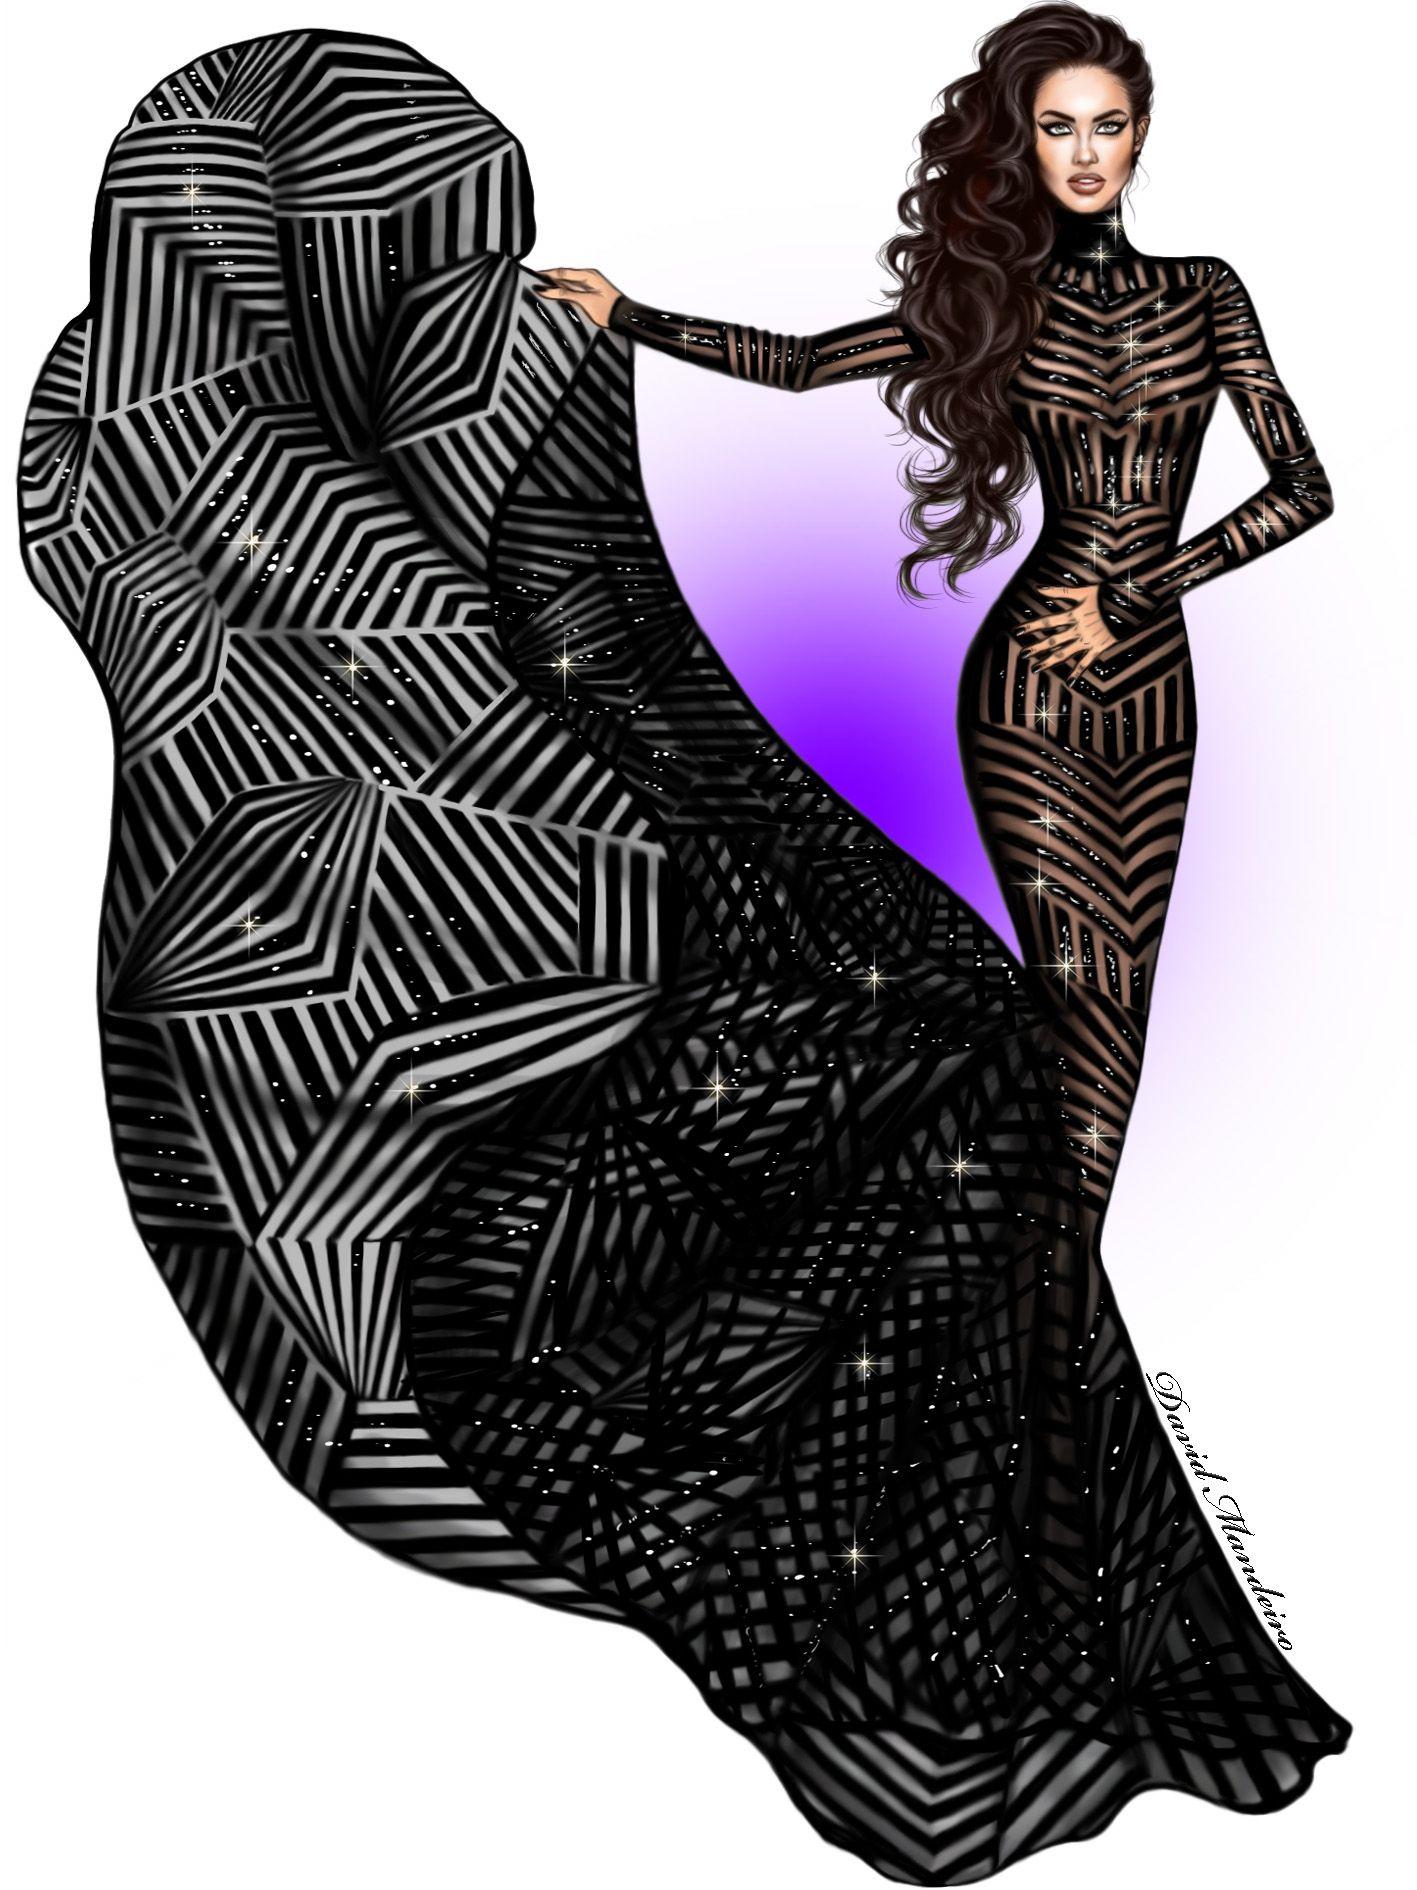 Fashion Illustration Dress